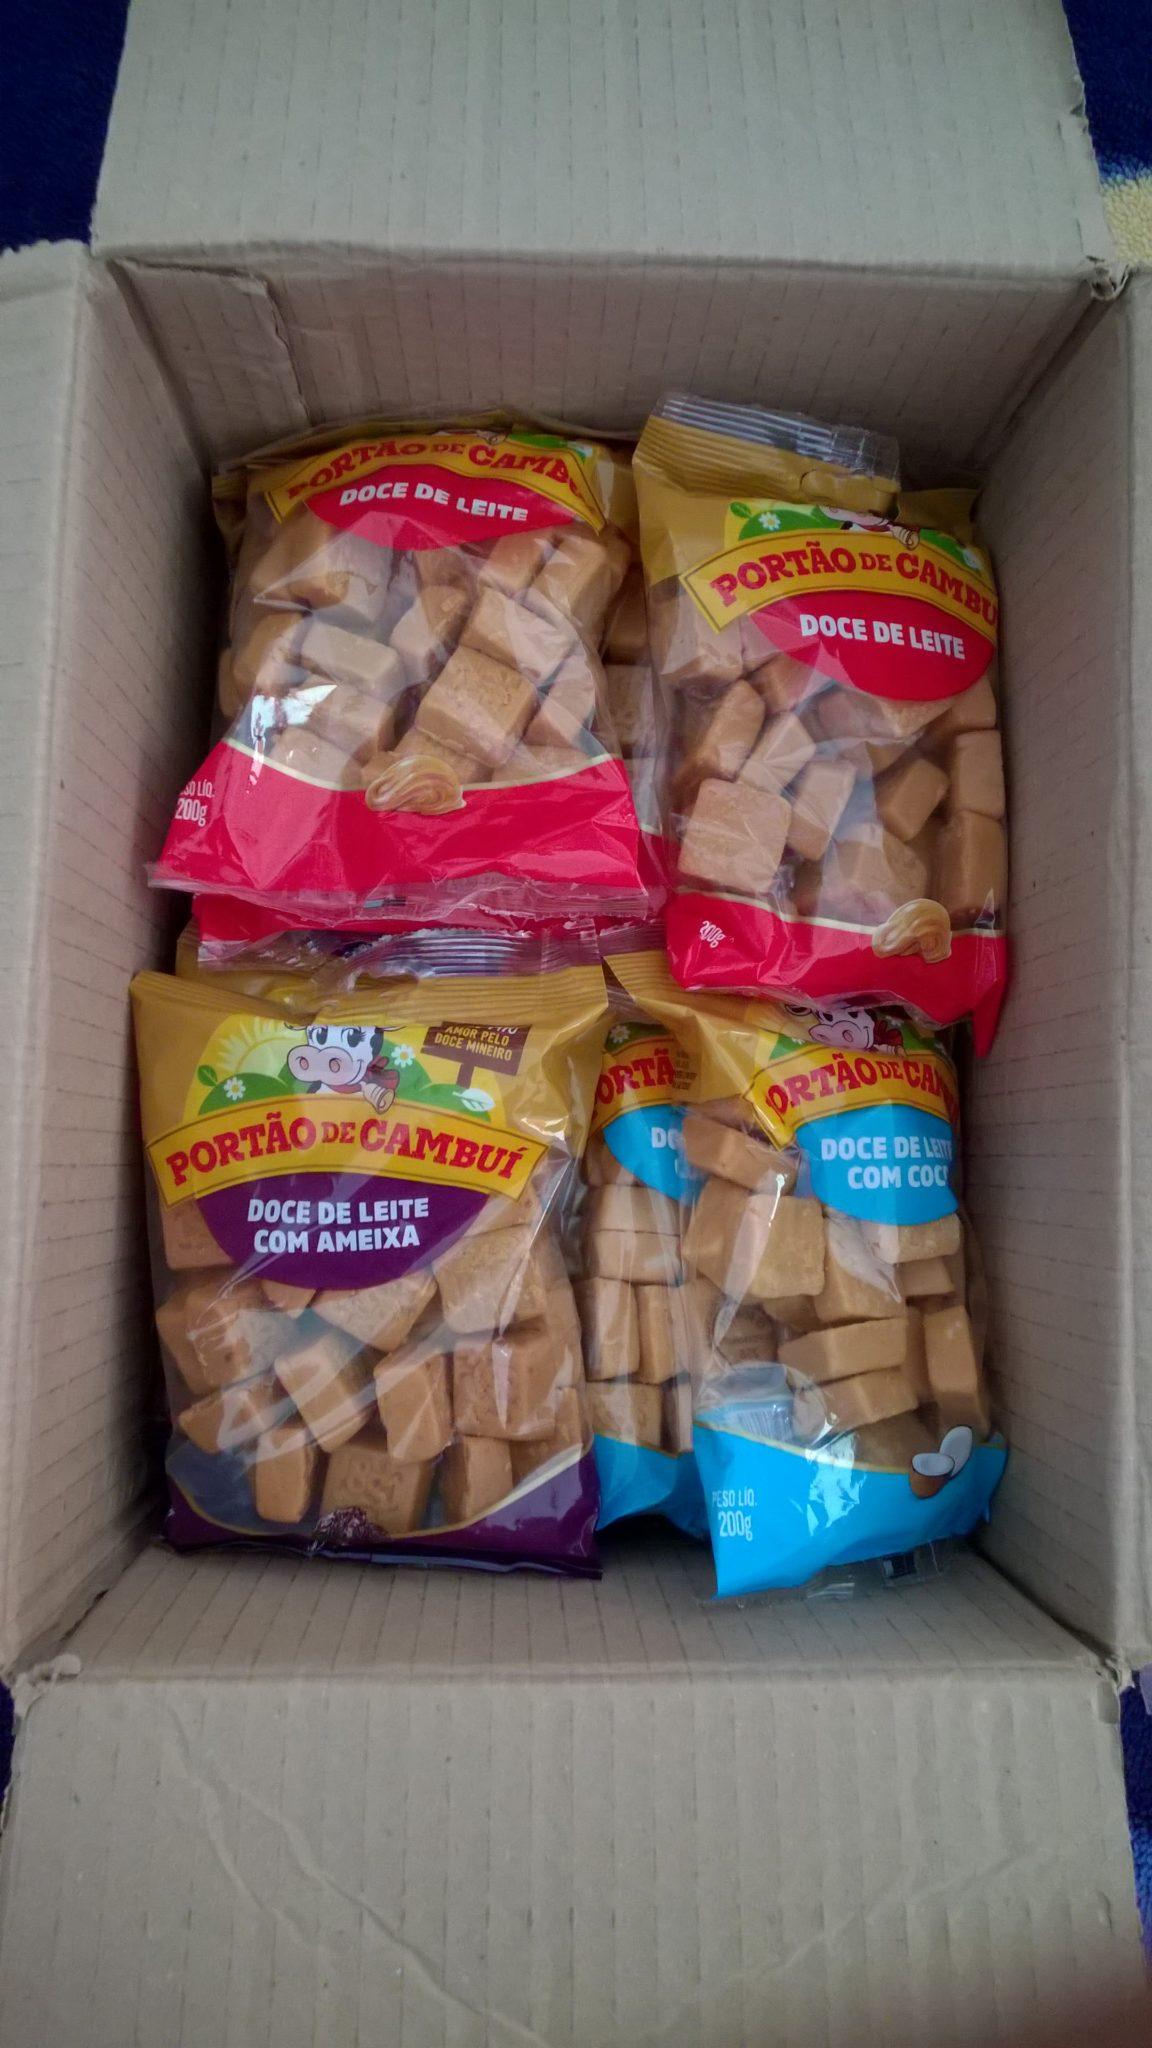 Os doces na caixa